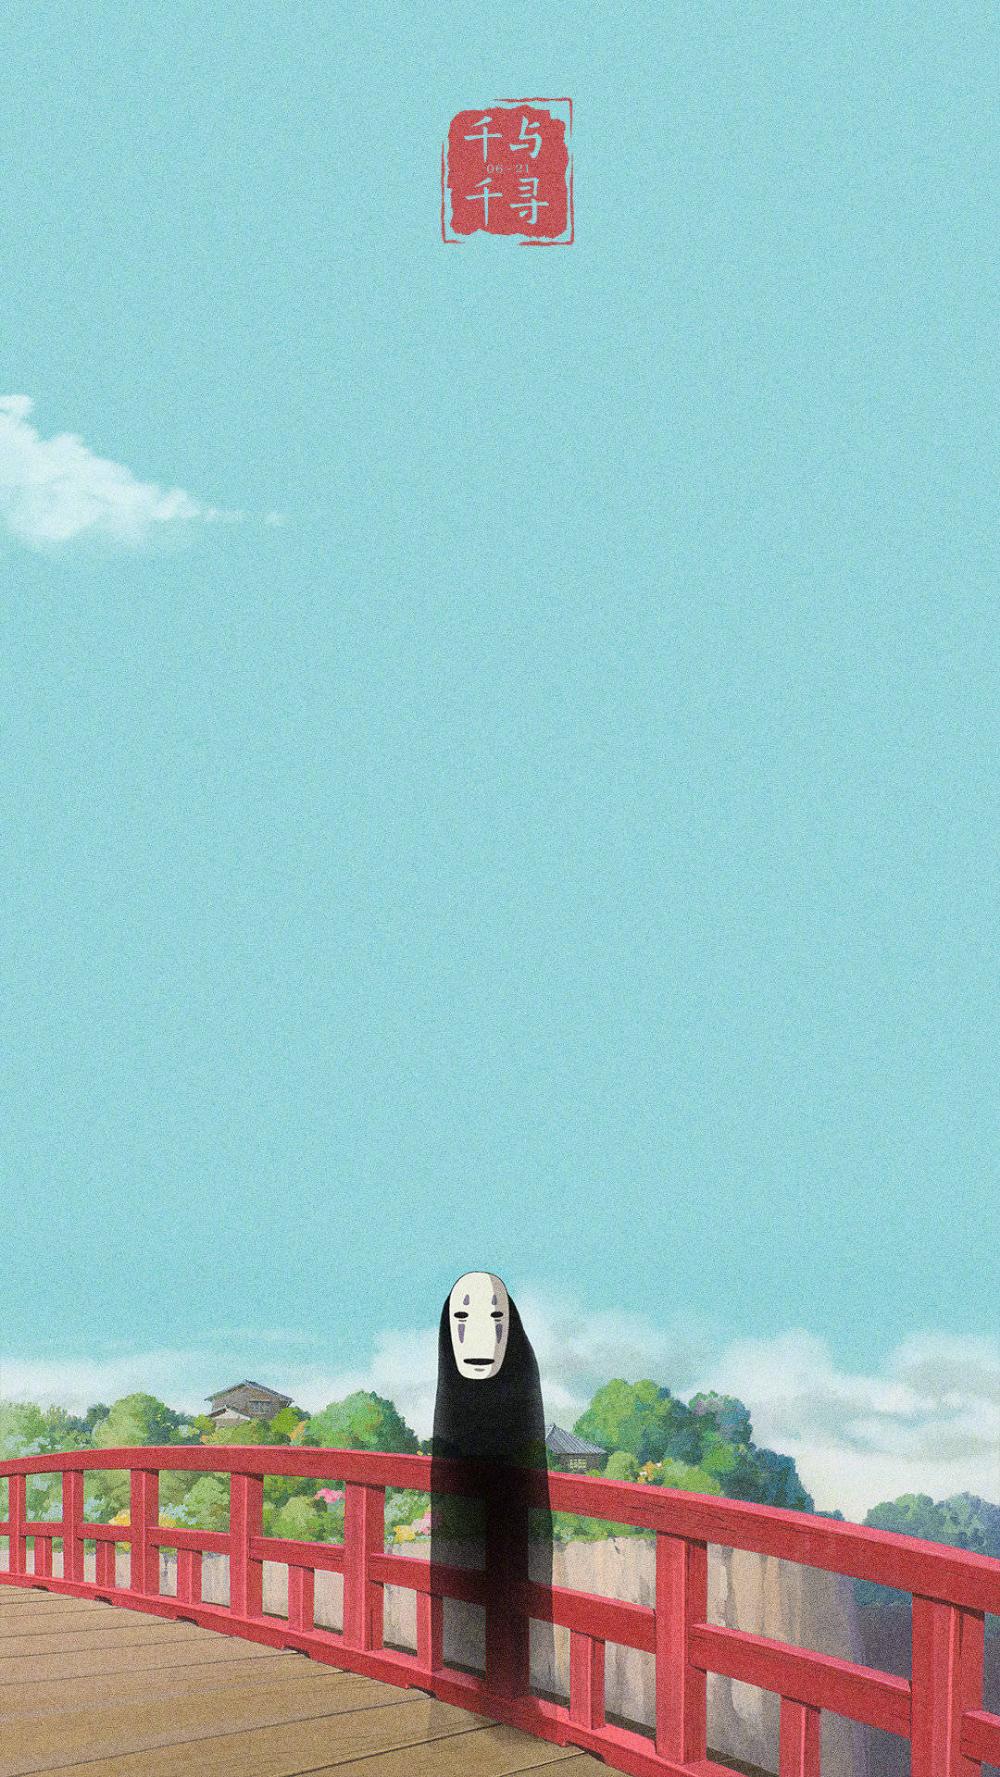 Wallpaper Spirited_Away 千と千尋の神隠し Spirited away